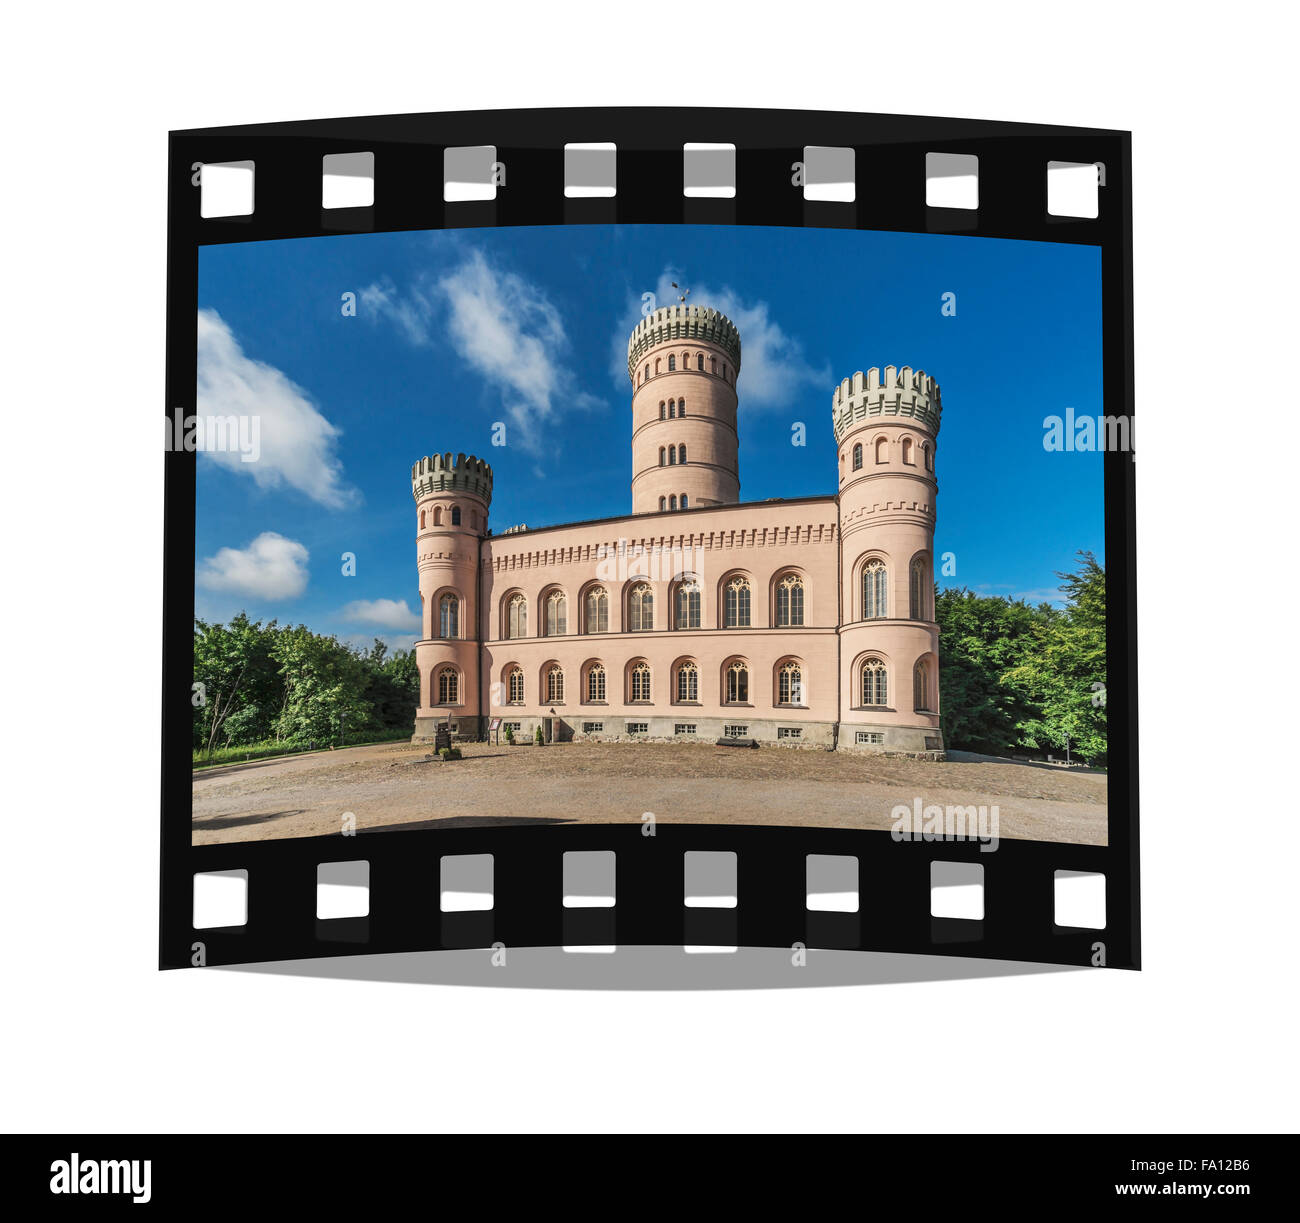 The Granitz Hunting Lodge, Ruegen Island, County Vorpommern-Ruegen, Mecklenburg-Western Pomerania, Germany, Europe - Stock Image